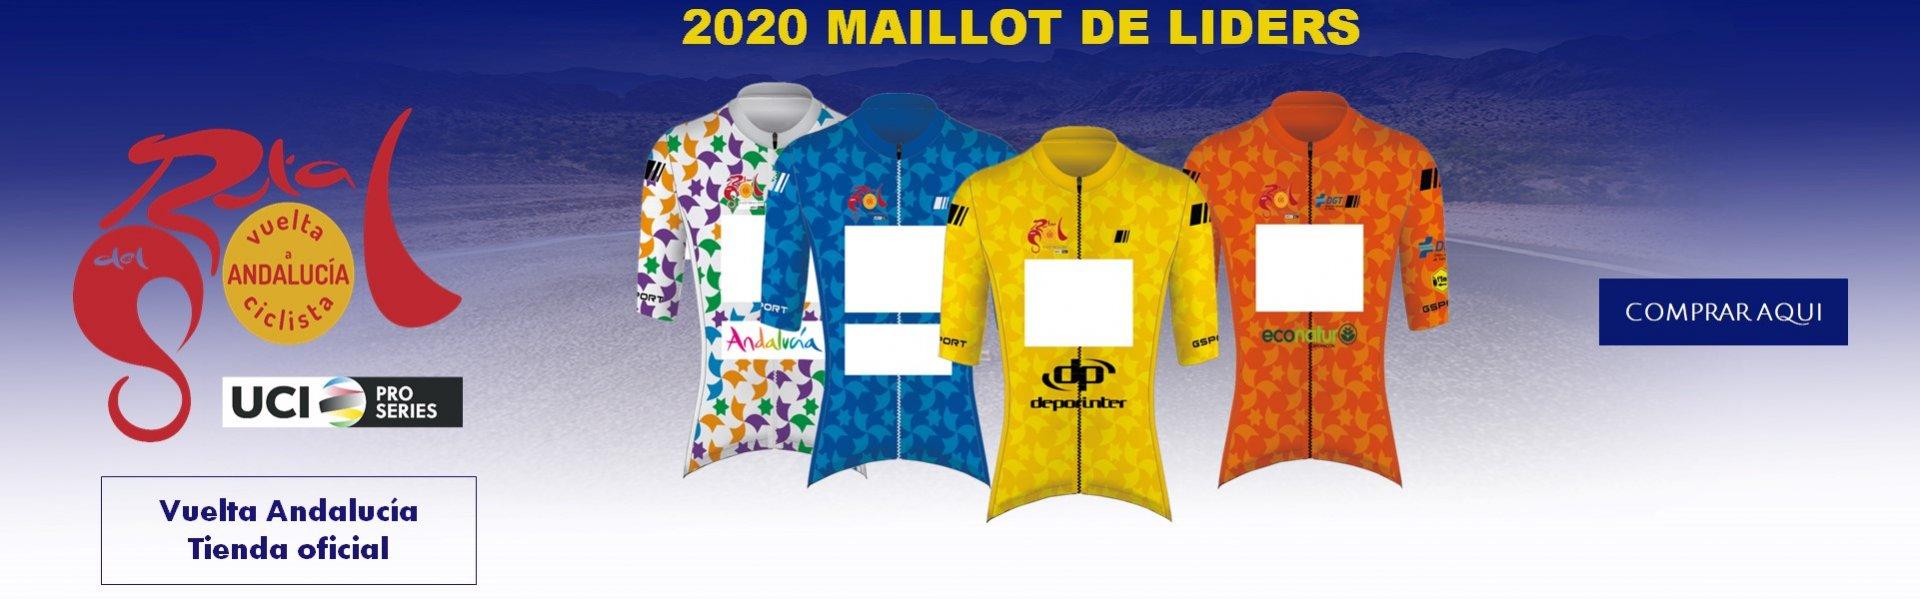 Maillot Lider V.3.jpg